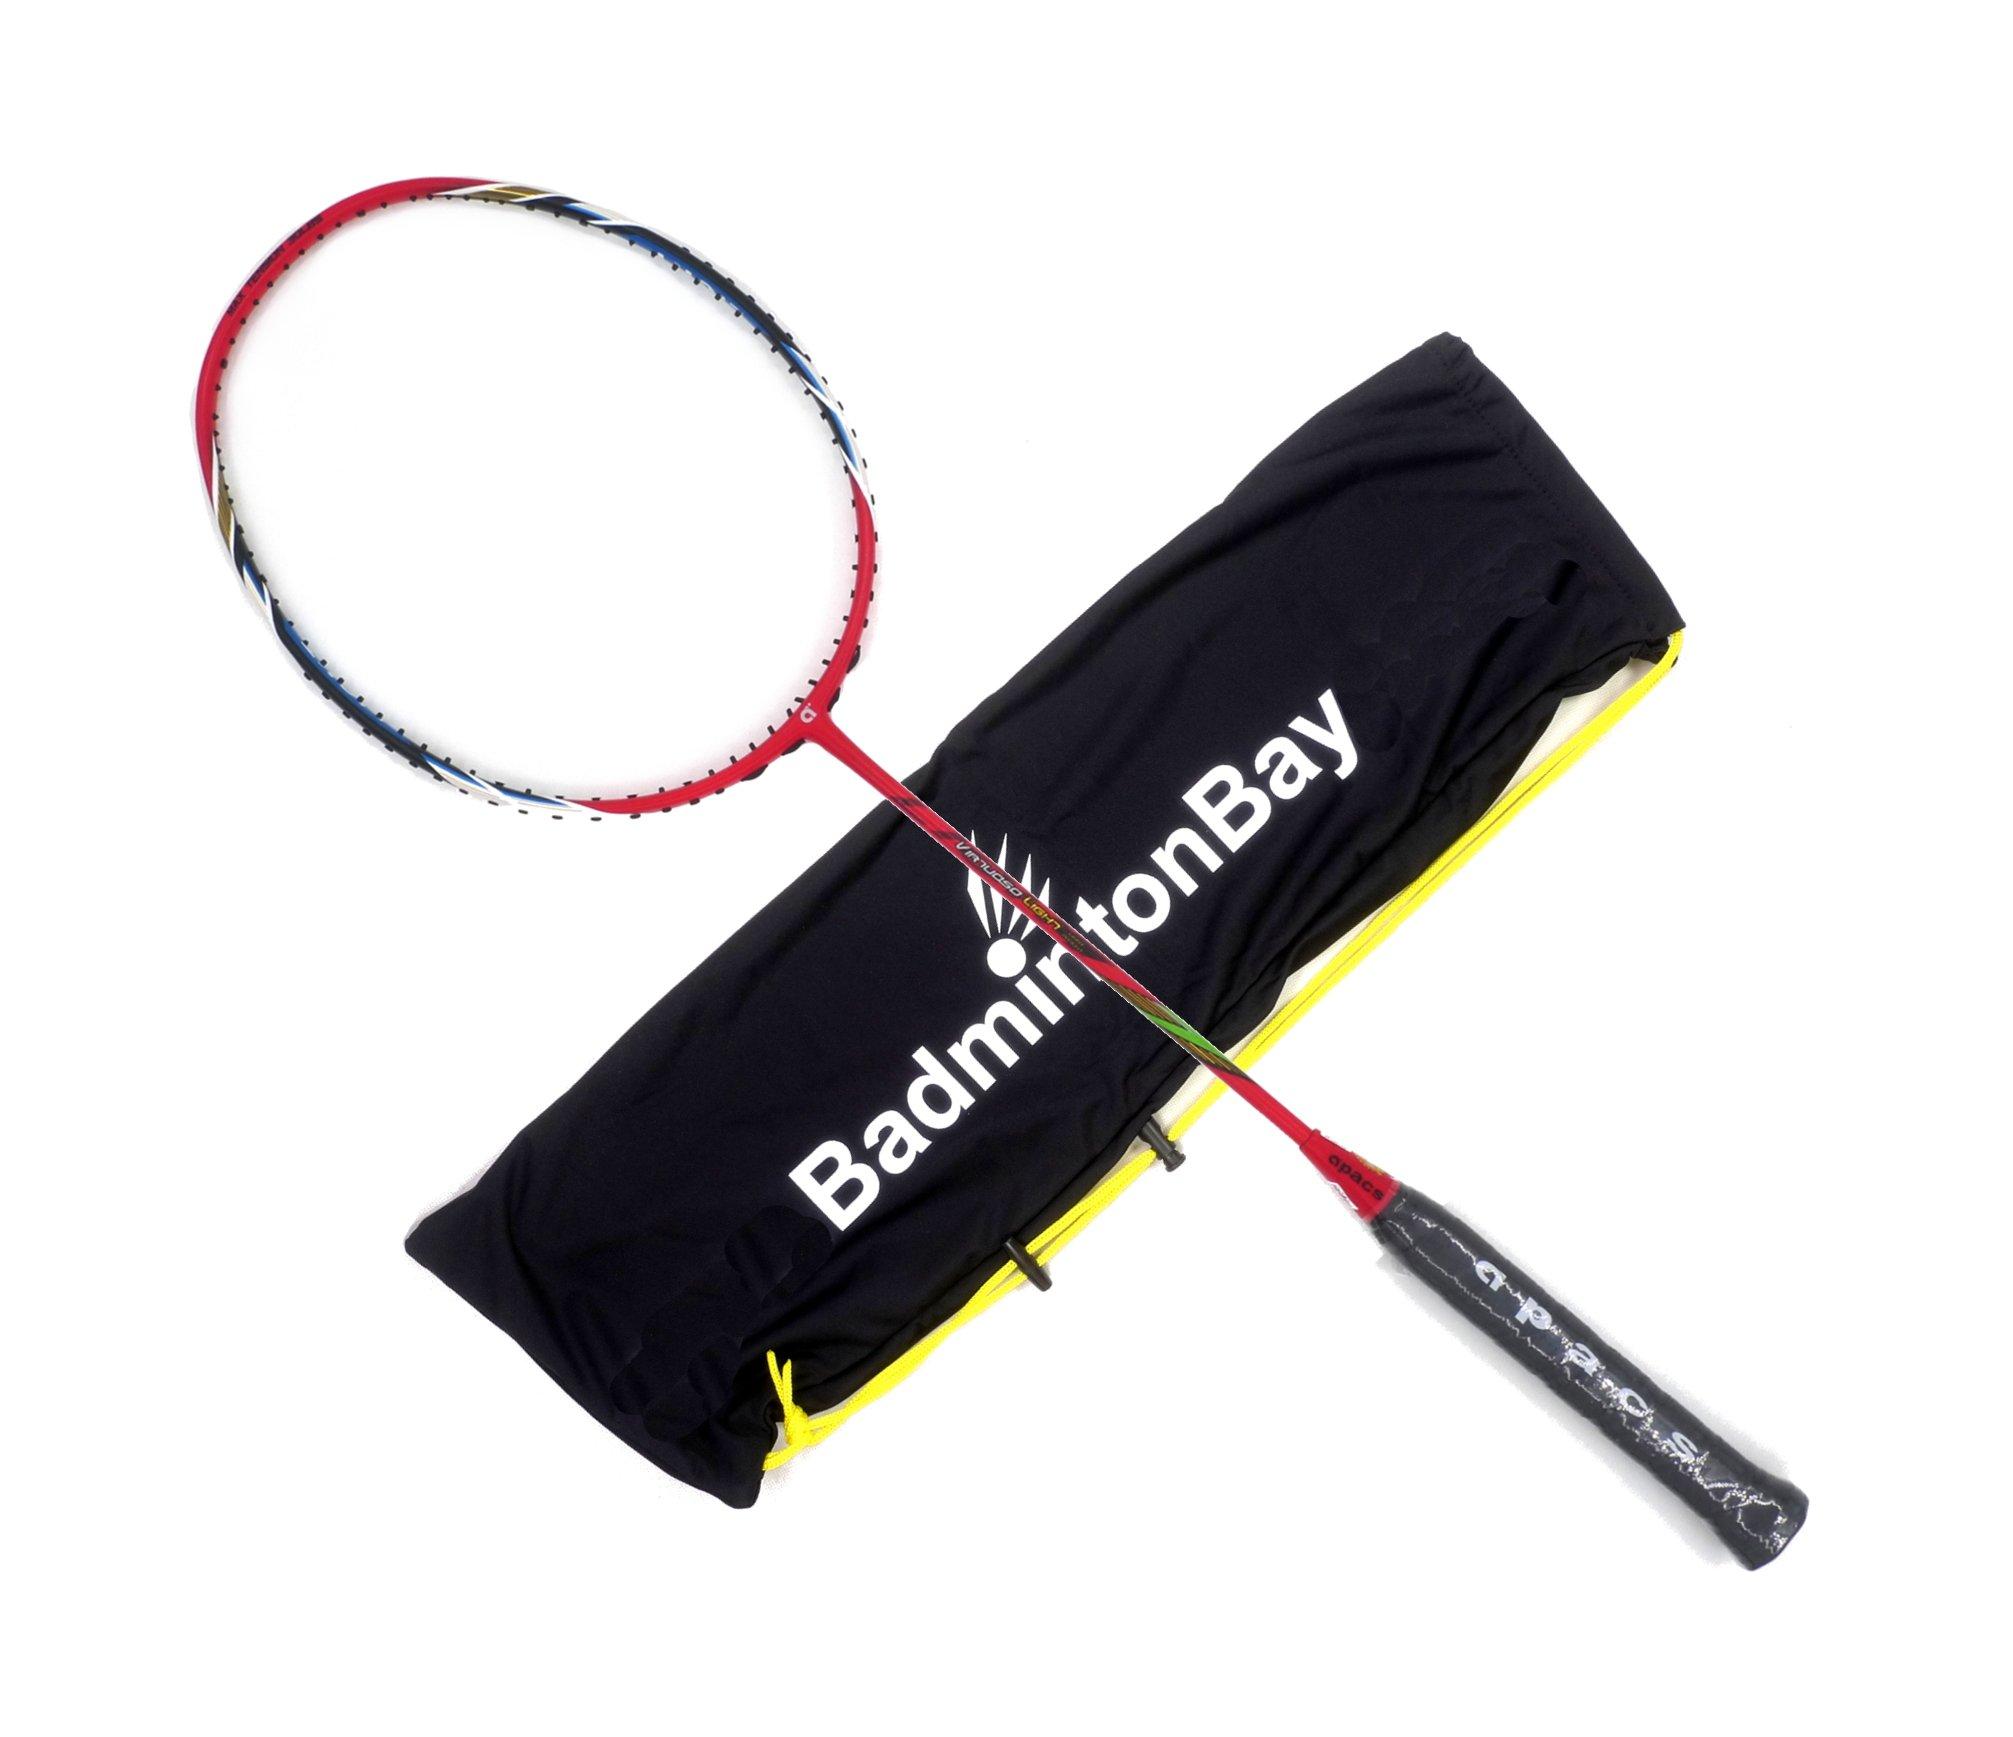 Apacs Virtuoso Light Red Badminton Racket (6U)